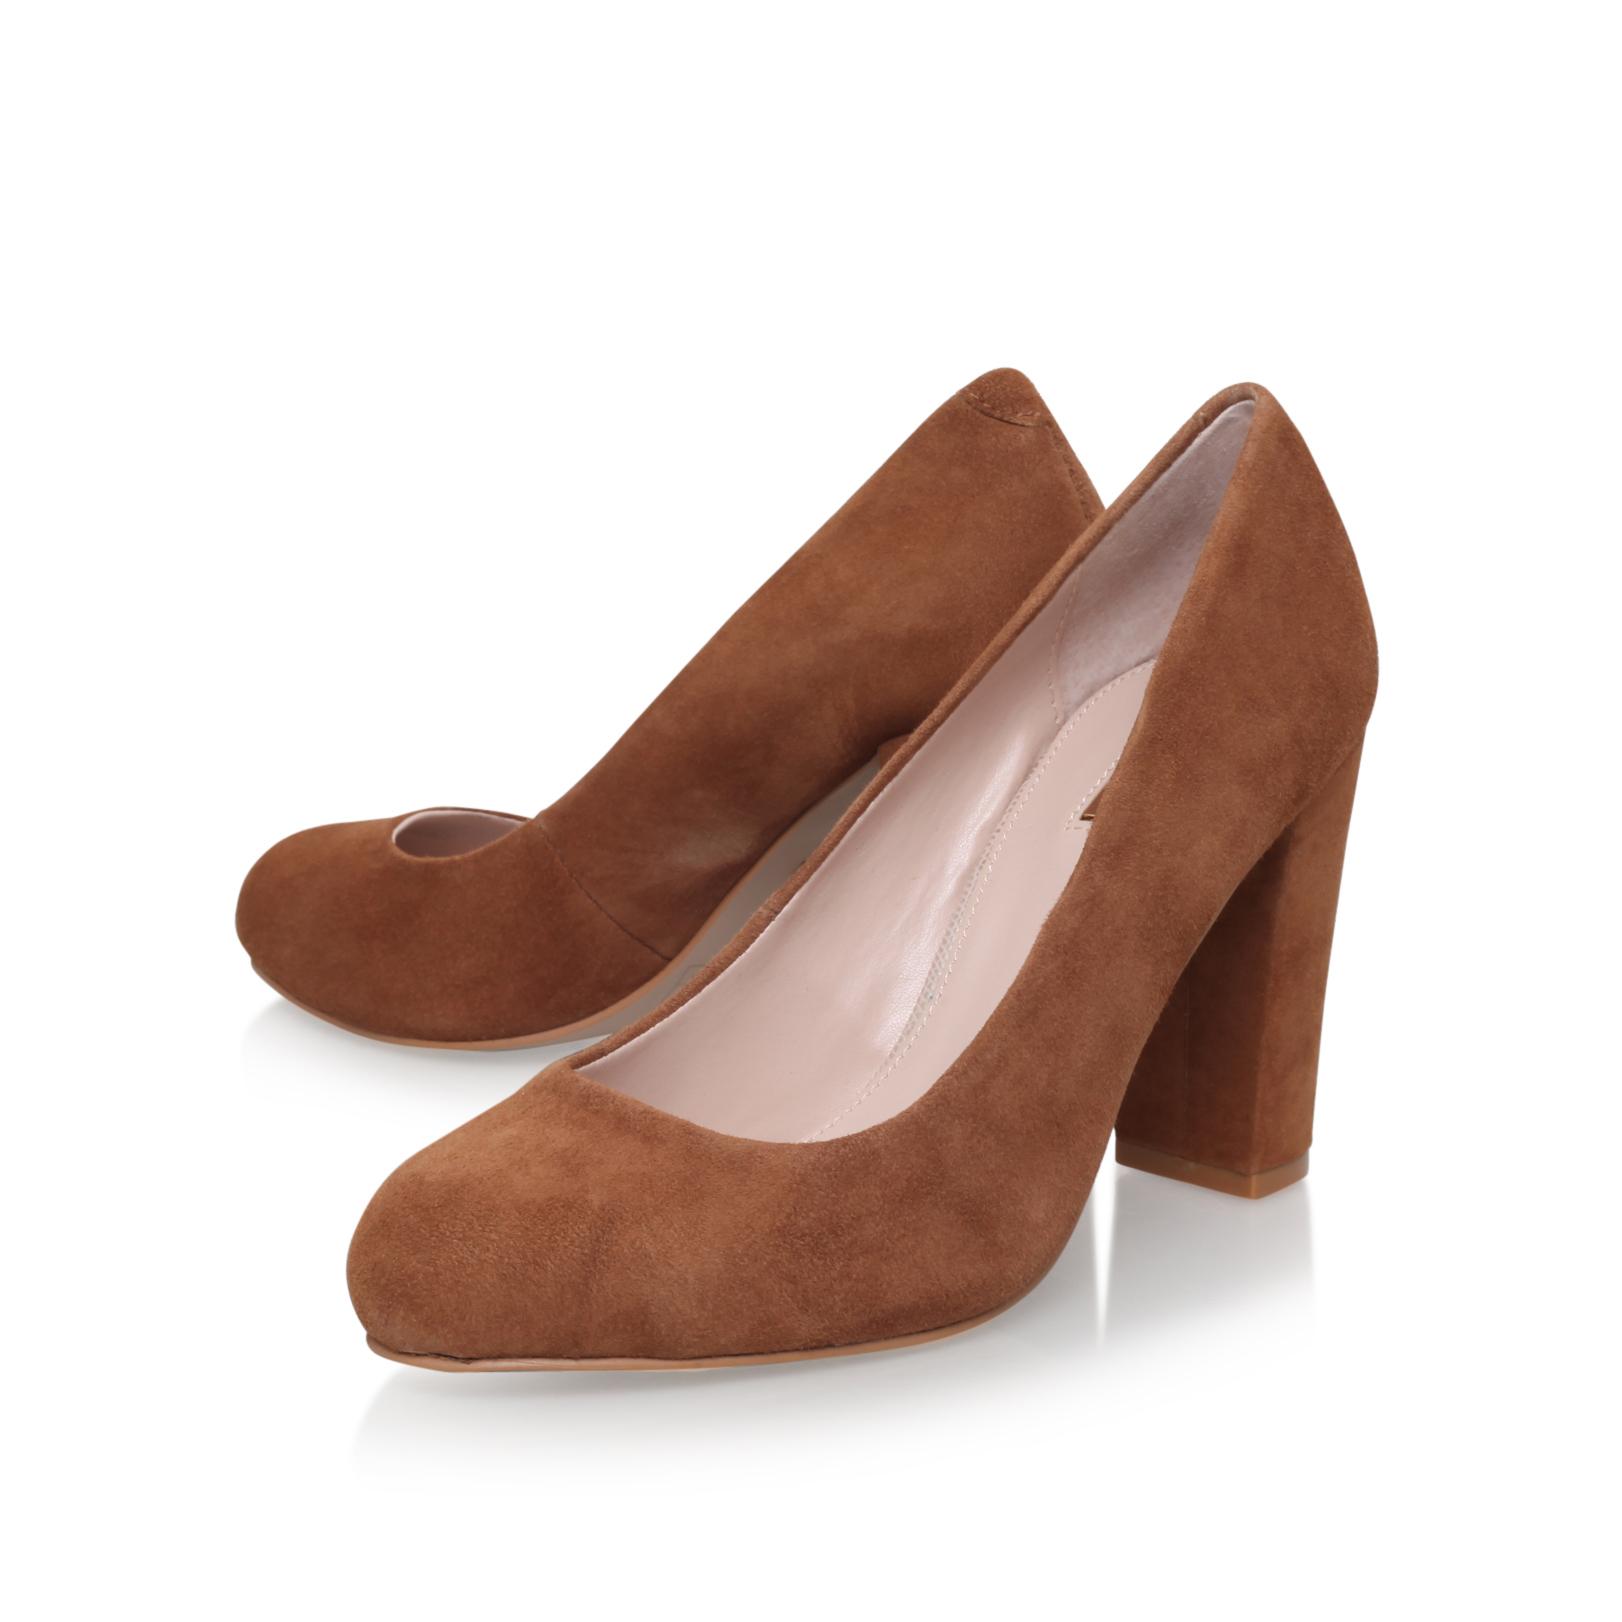 Carvela Shoes Size Guide